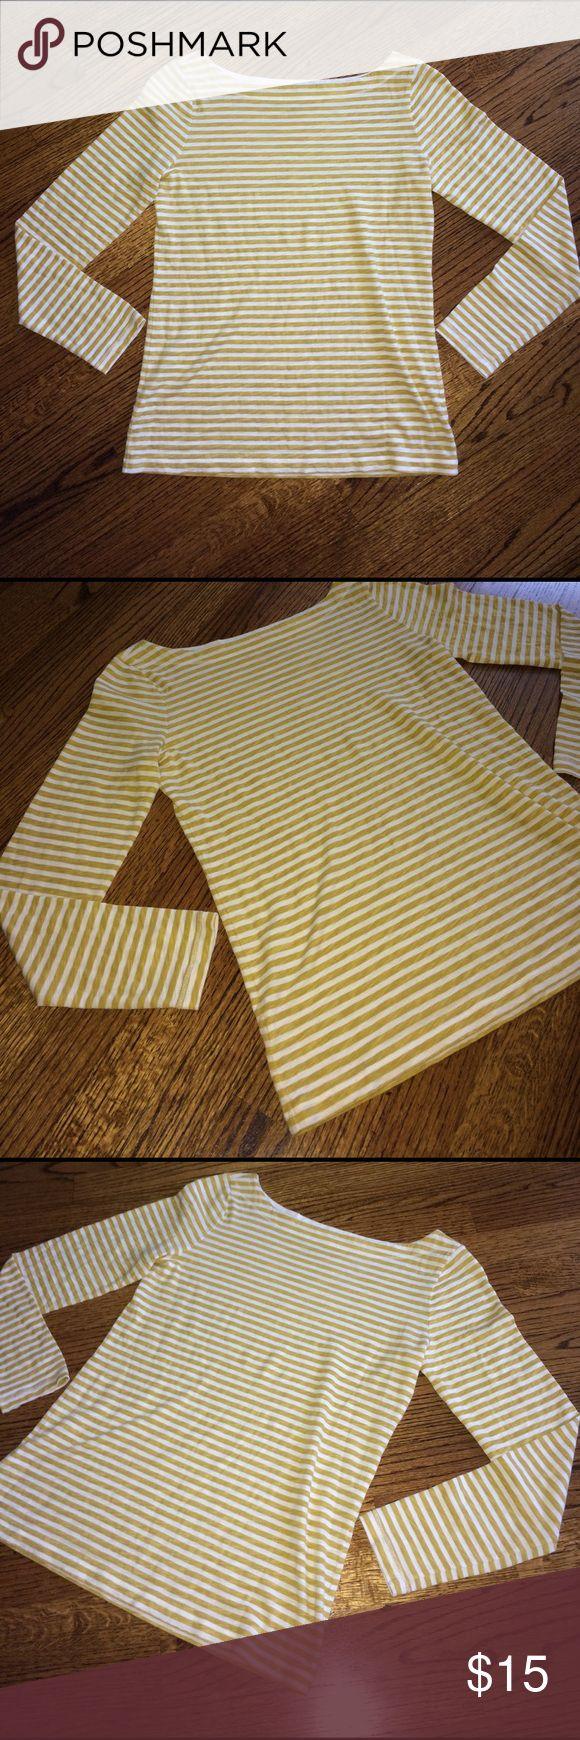 "NWOT mustard and cream tee NWOT mustard and cream. Sleeves 19.5"" shoulder to bottom of tee 24"" LOFT Tops Tees - Long Sleeve"